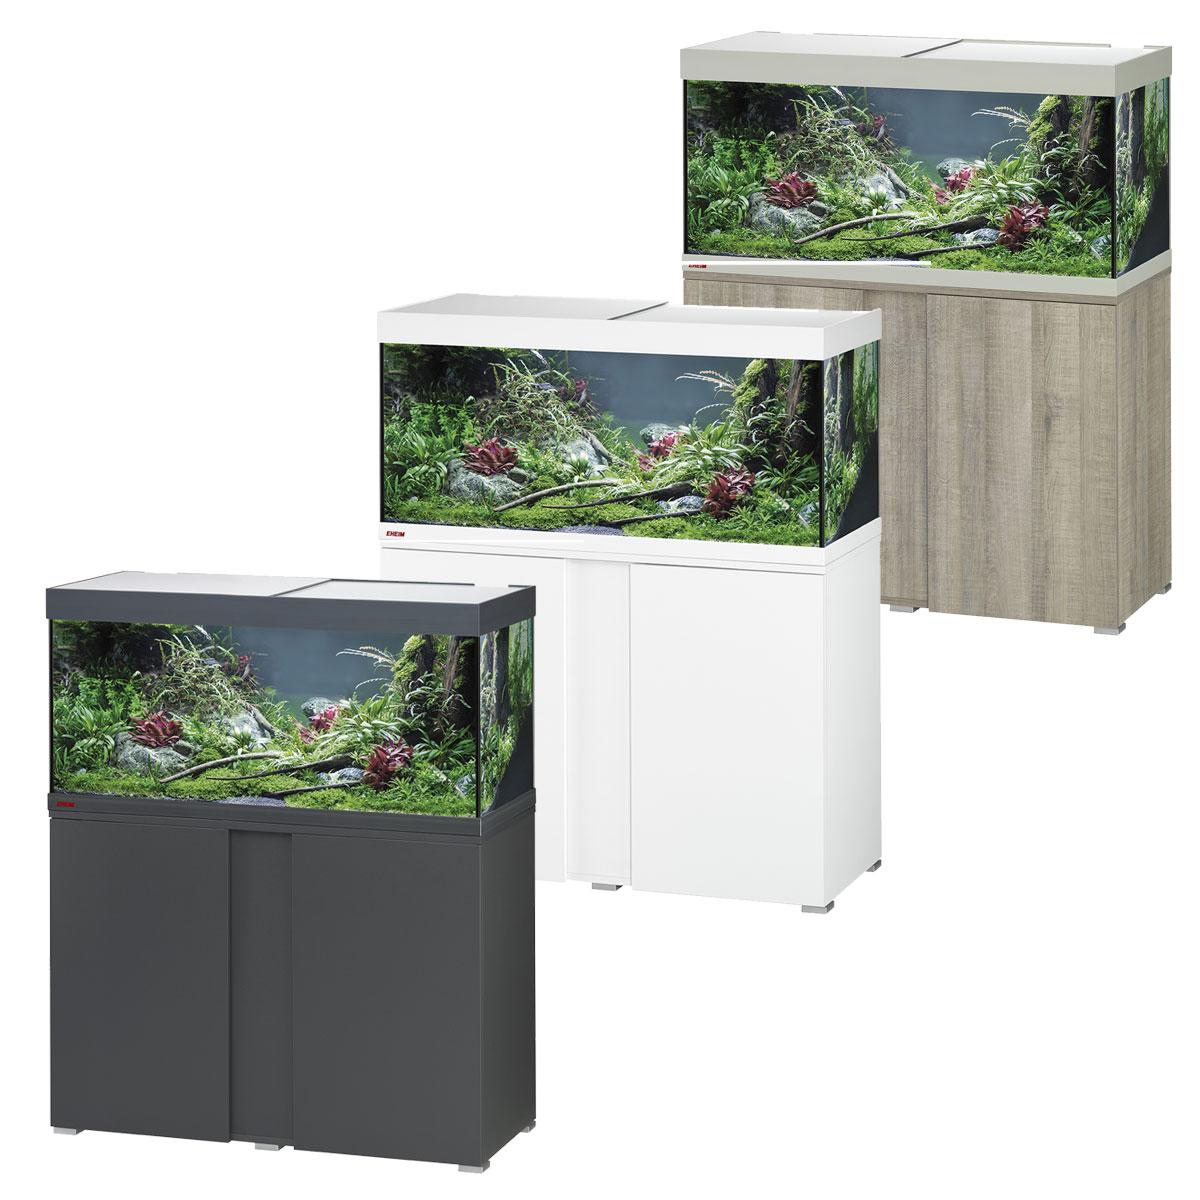 eheim vivaline komplettaquarium mit led 180 liter bei zooroyal. Black Bedroom Furniture Sets. Home Design Ideas